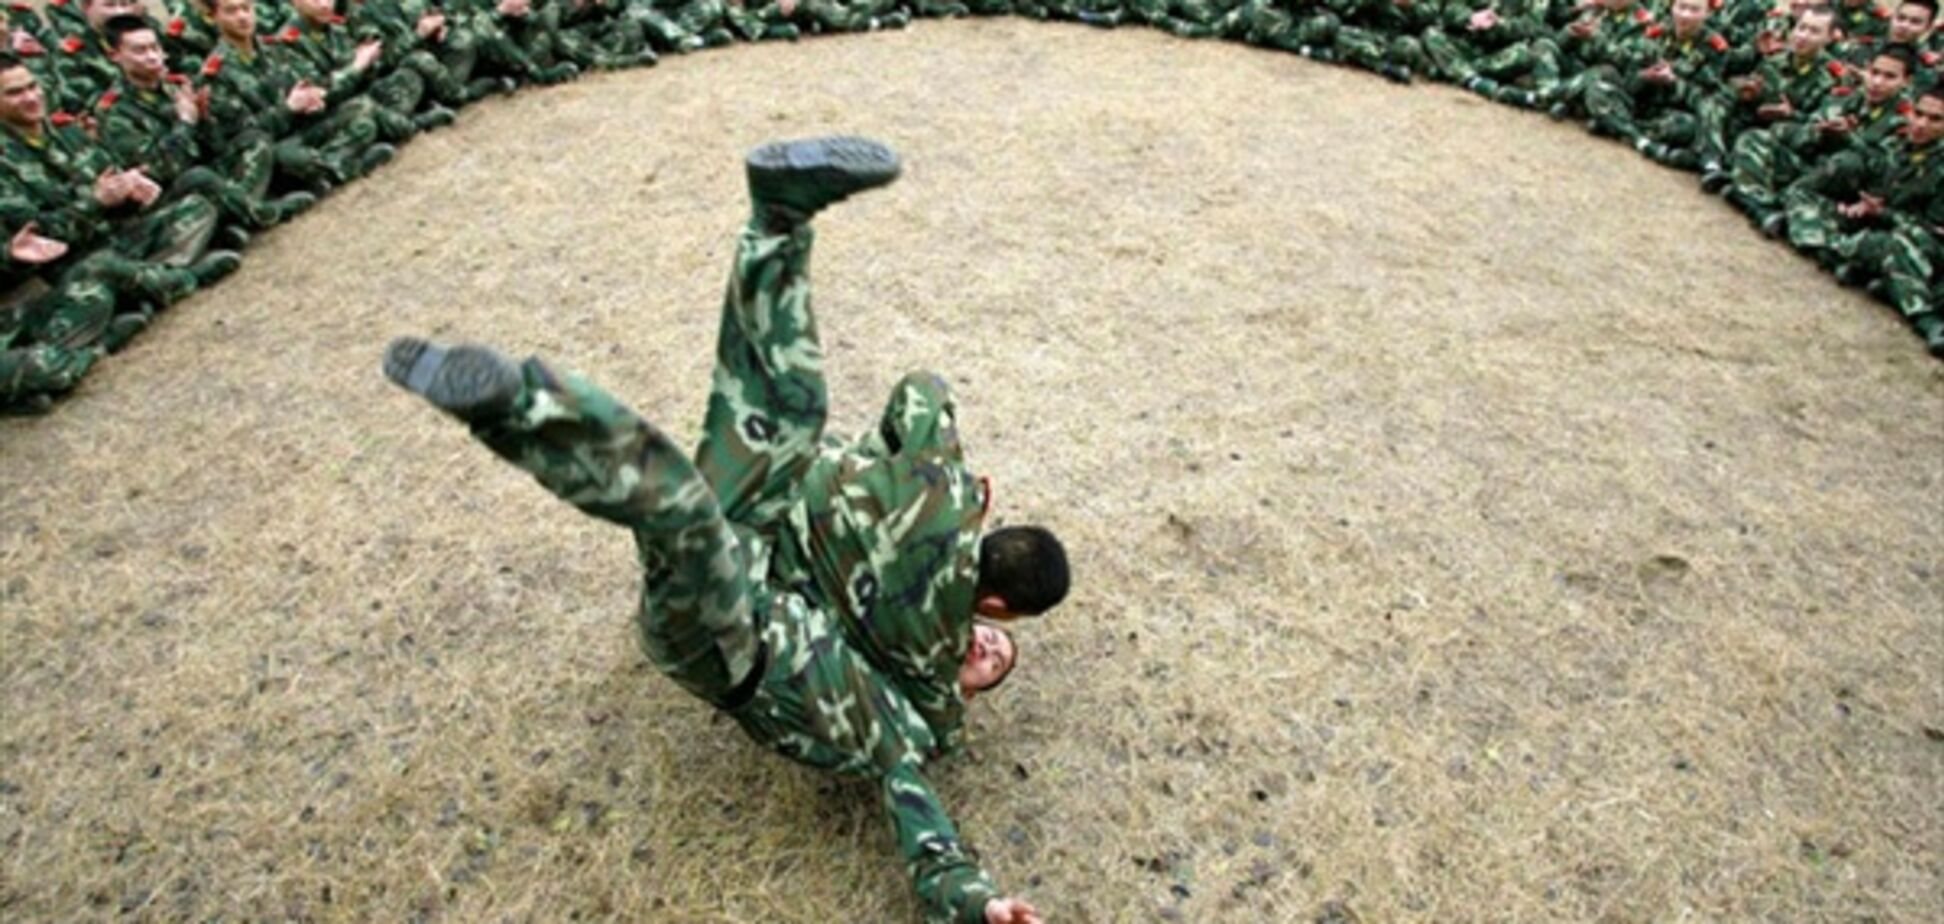 Расстрел террориста, захватившего девушку в Китае. ВИДЕО